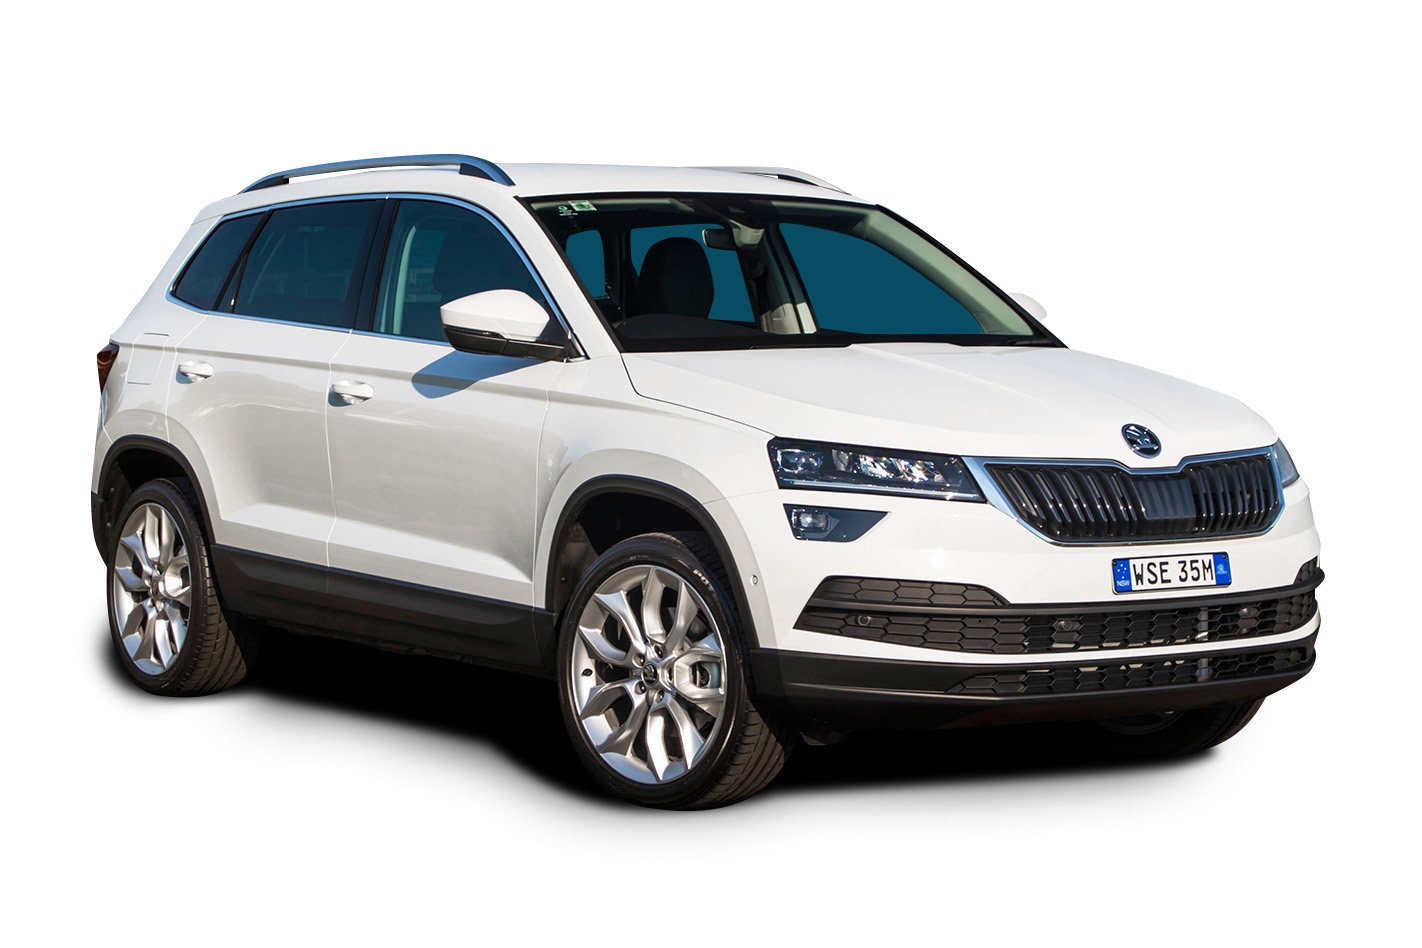 2021 Skoda Karoq 110 Tsi 1 4l 4cyl Petrol Turbocharged Automatic Suv